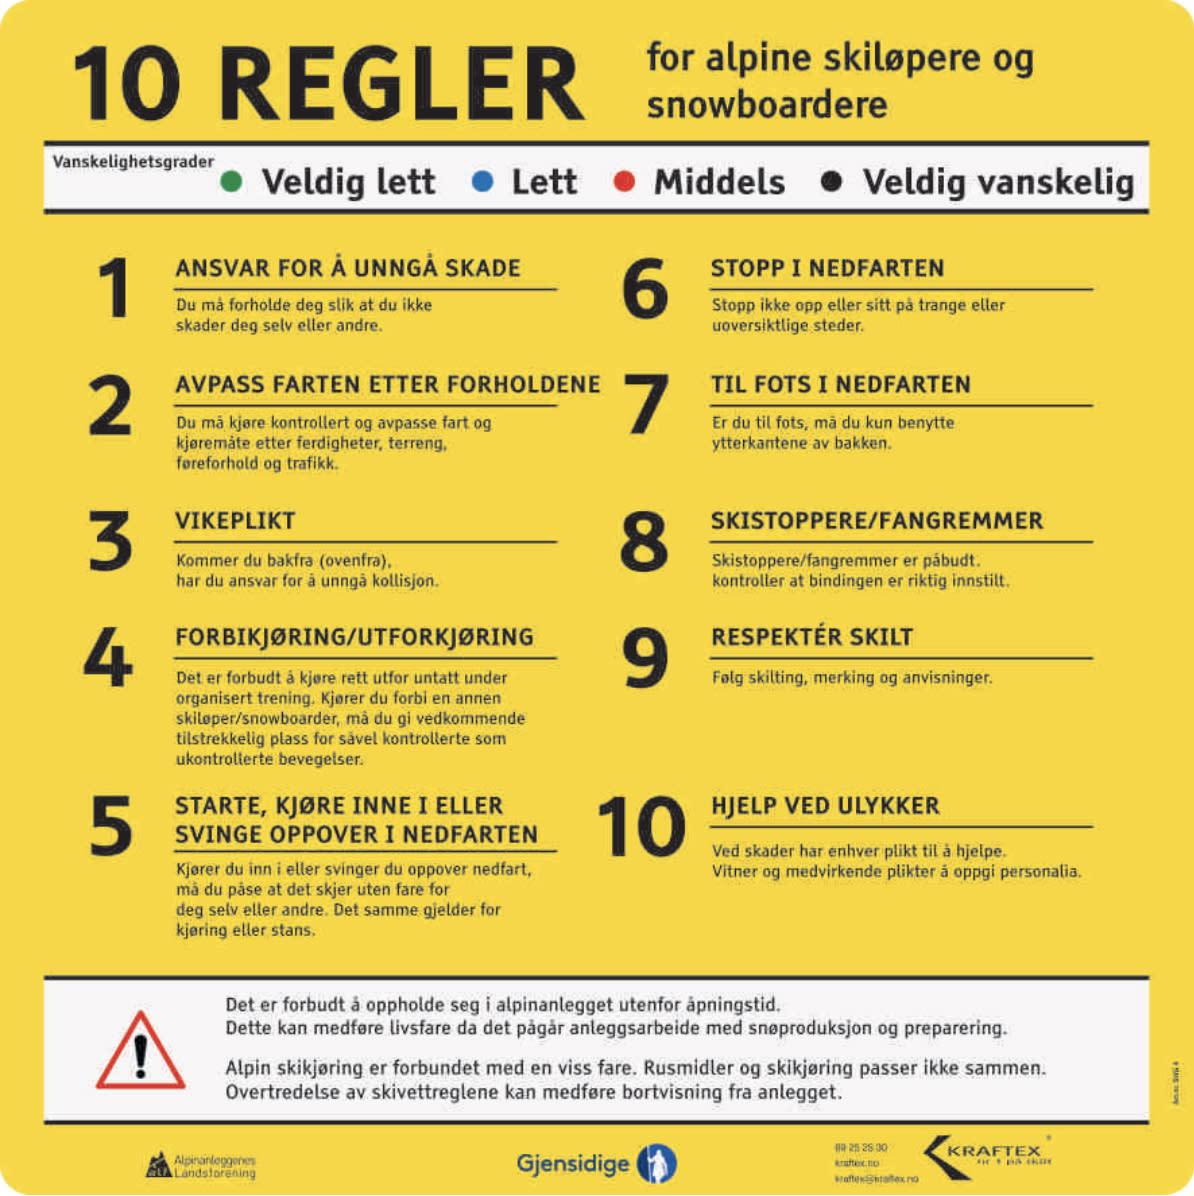 Regler for alpine skiløpere og snowboardere